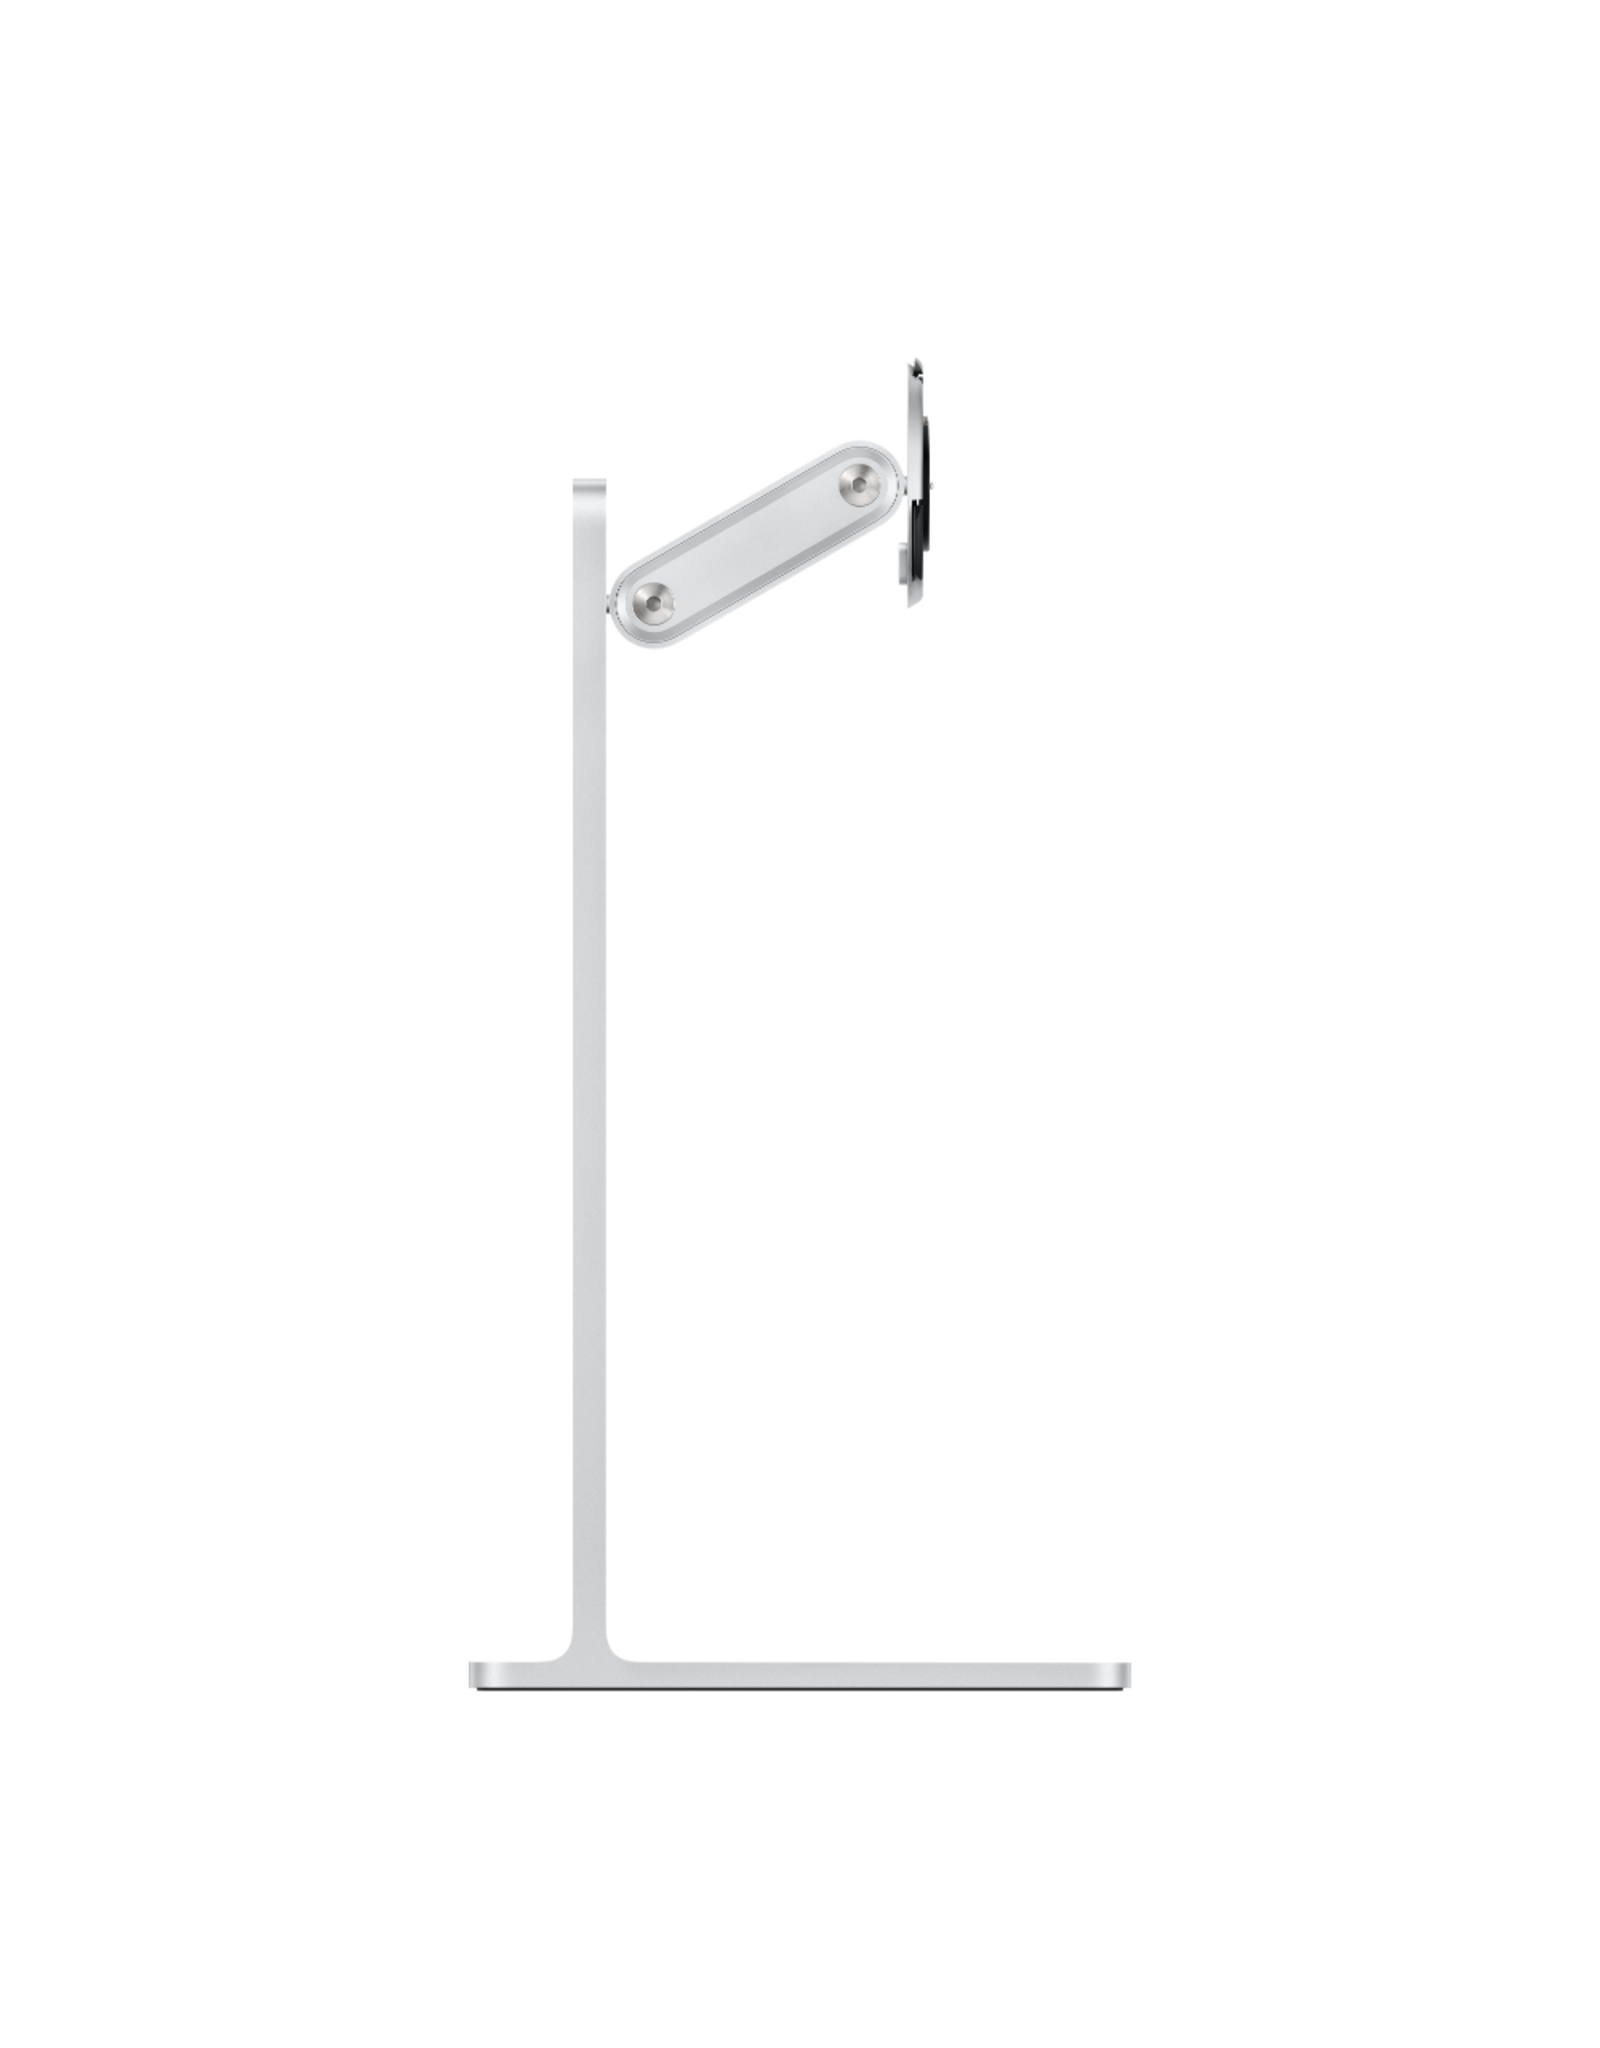 Apple Apple Pro Stand